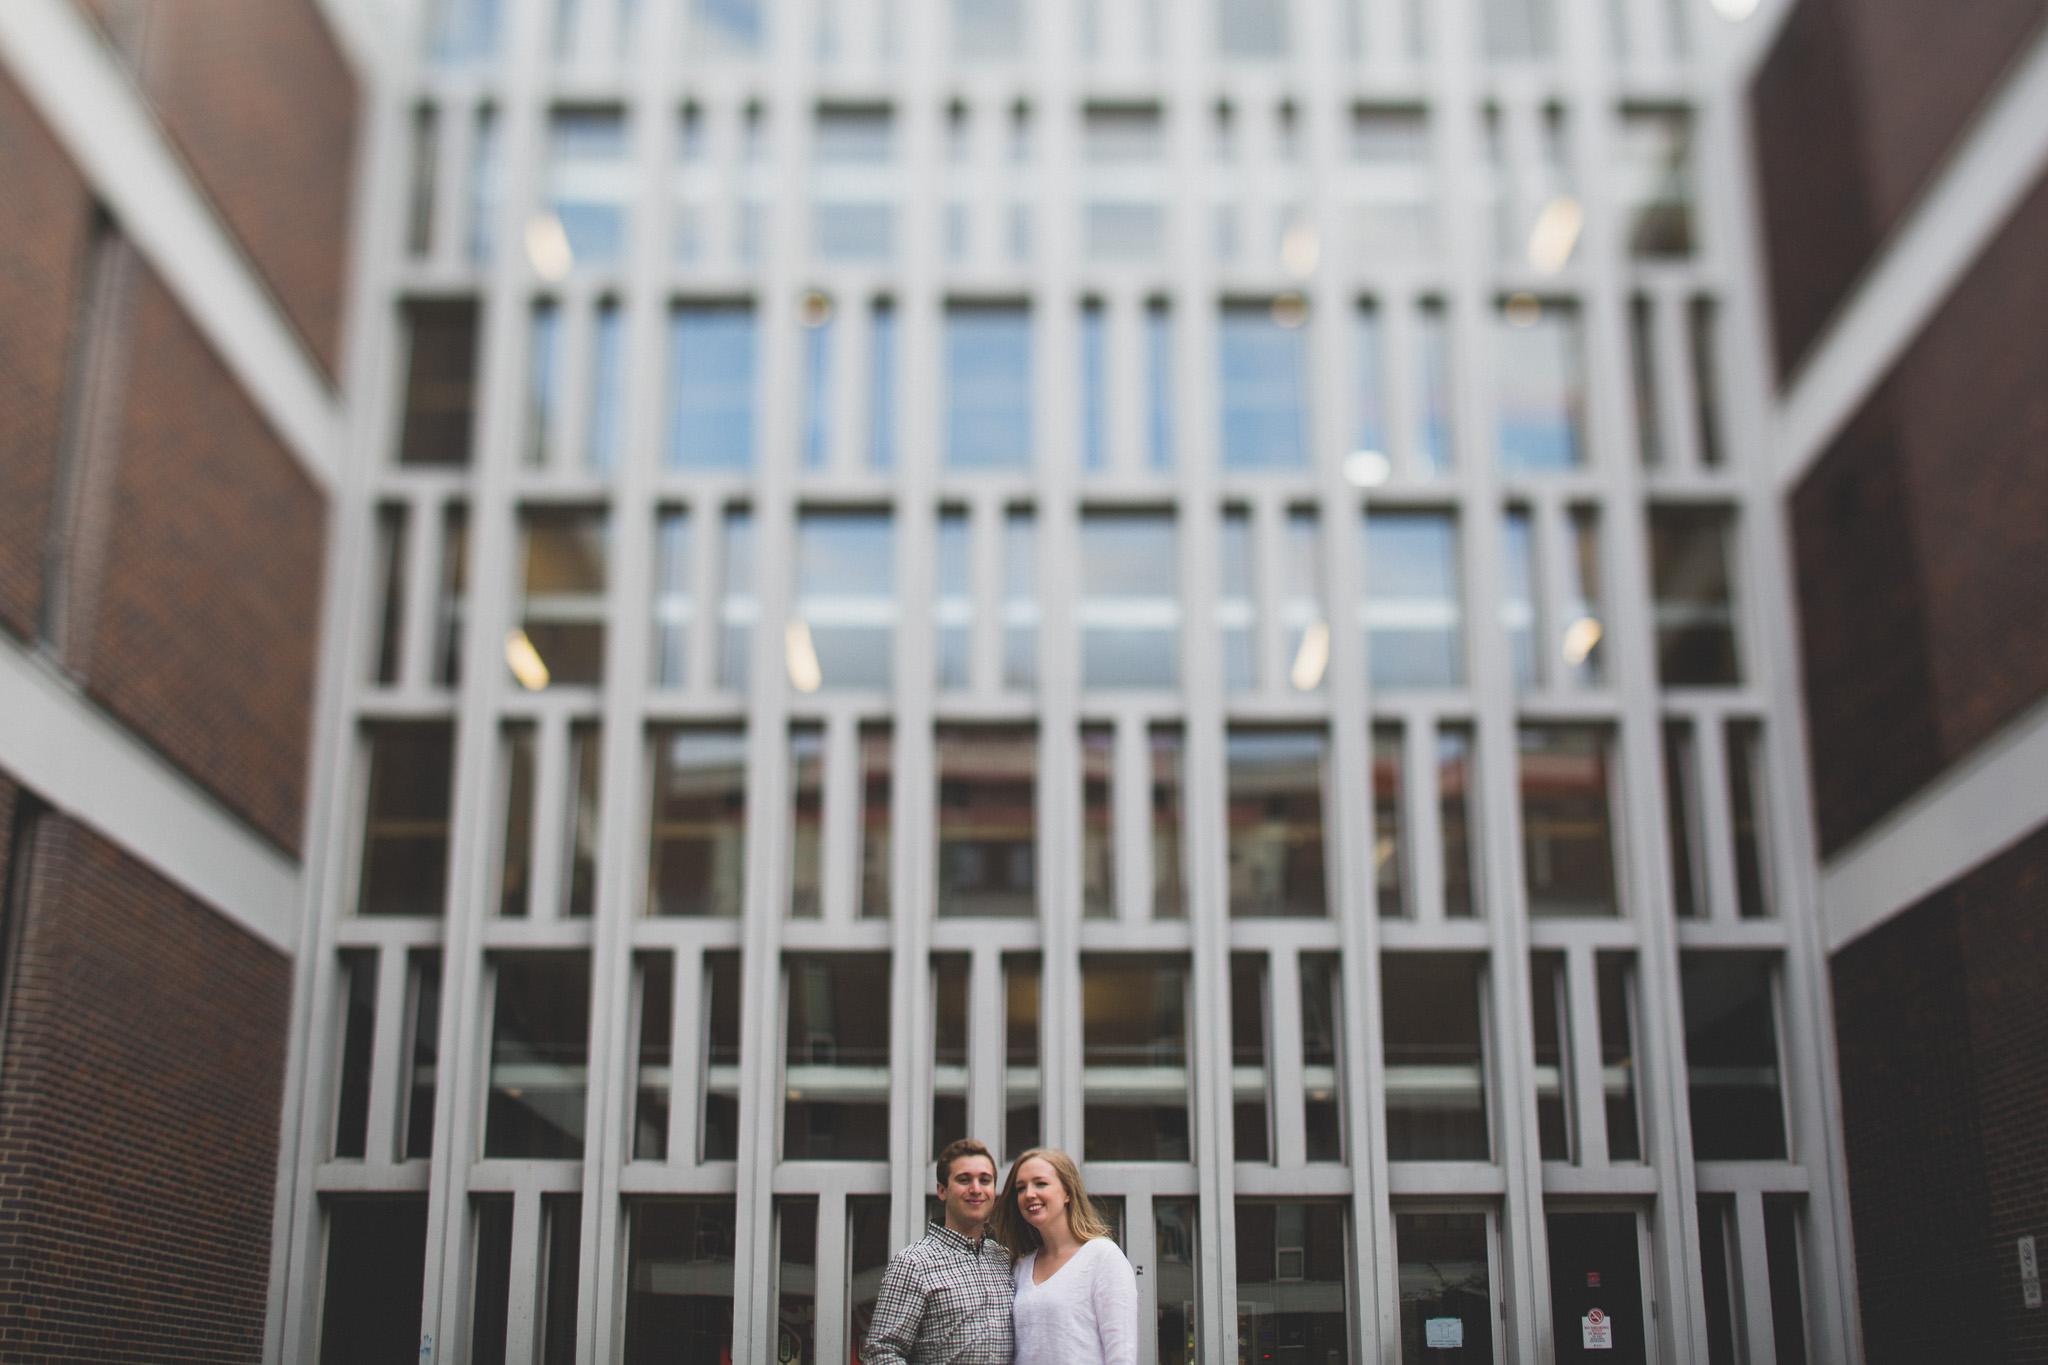 002-Jonathan-Kuhn-Photography-Marc-Kelsey-Engagement-WEB-7475.jpg